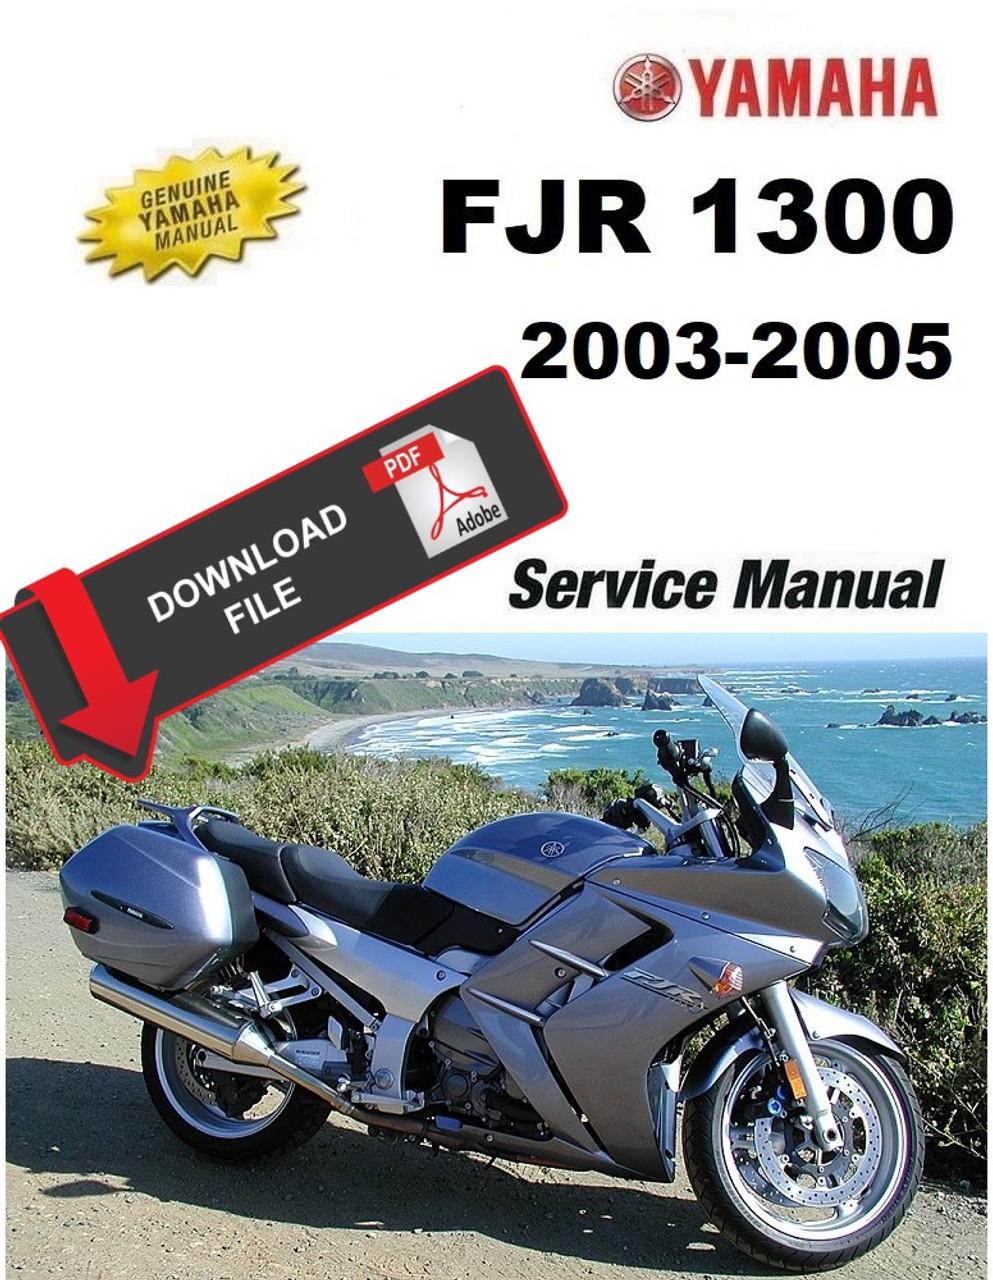 2016-2019 yamaha fjr1300 motorcycle service manual: lit-11616-29.